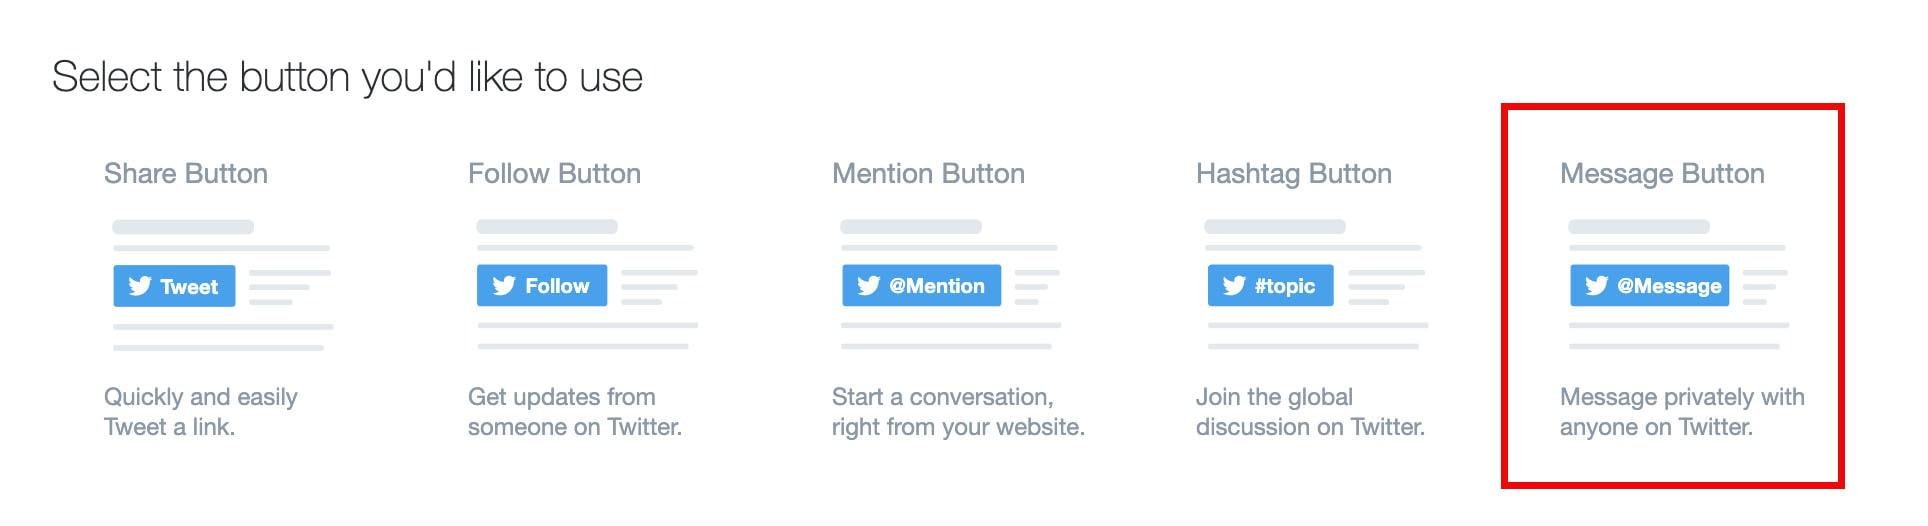 message button twitter developer page